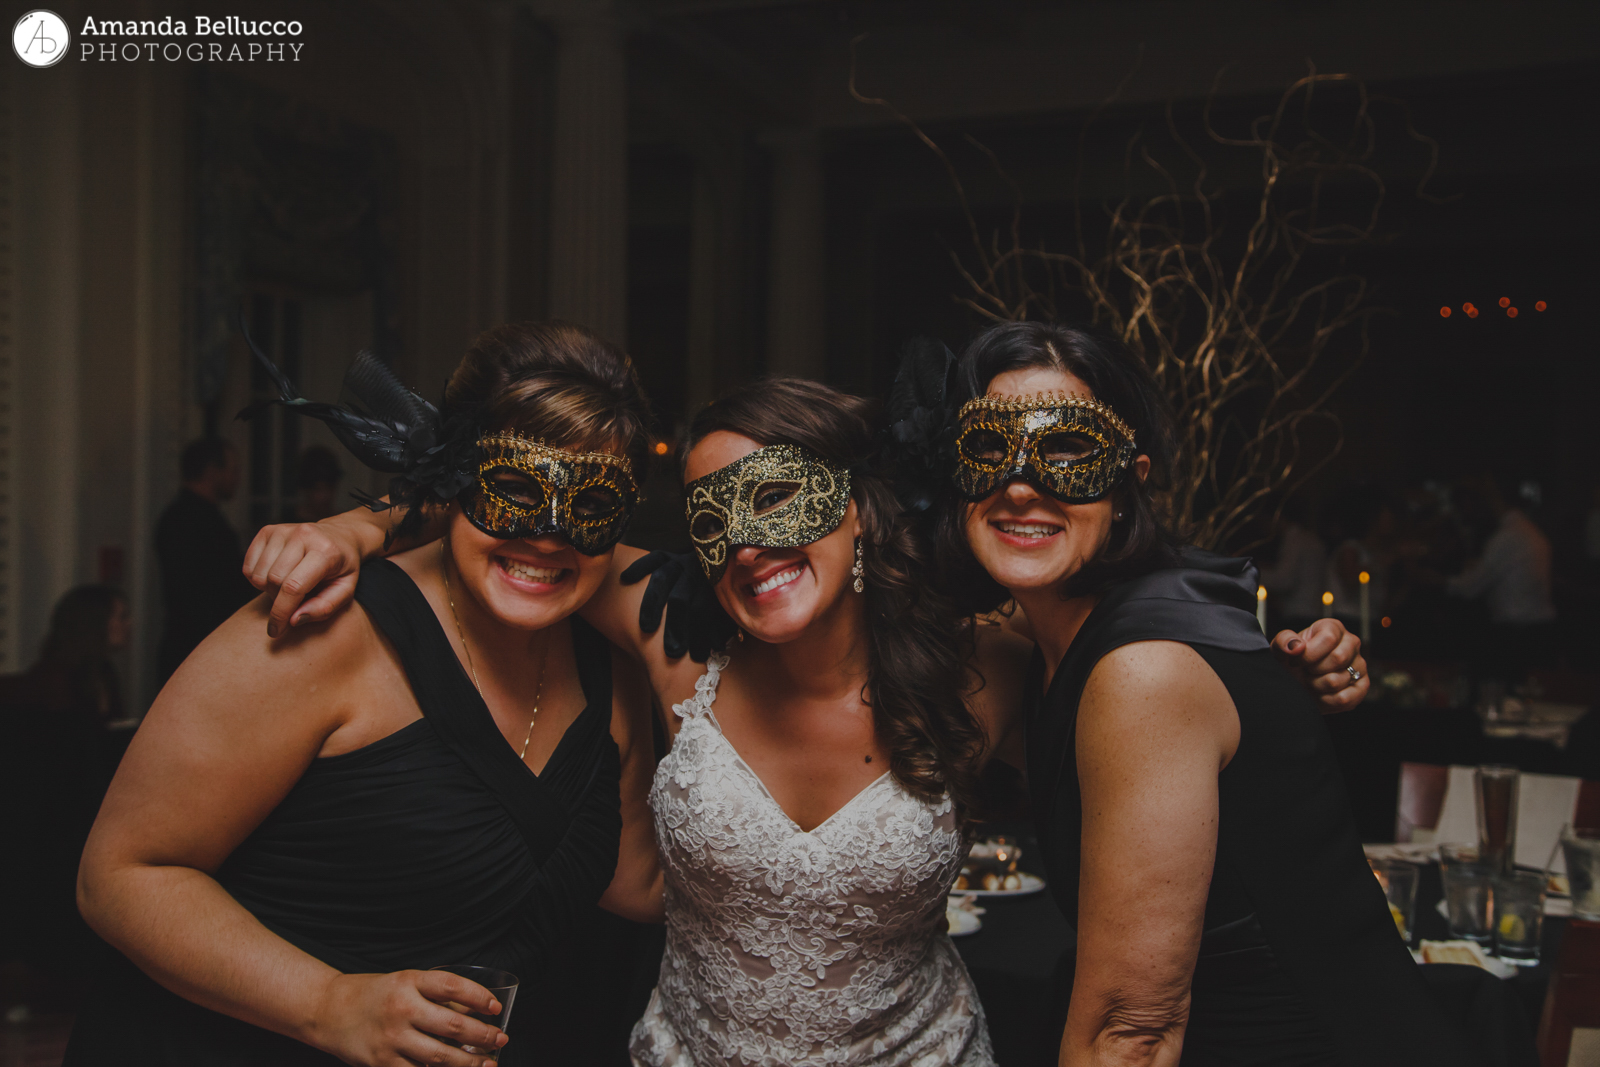 syracuse-rochester-fine-art-wedding-photographer-178.JPG